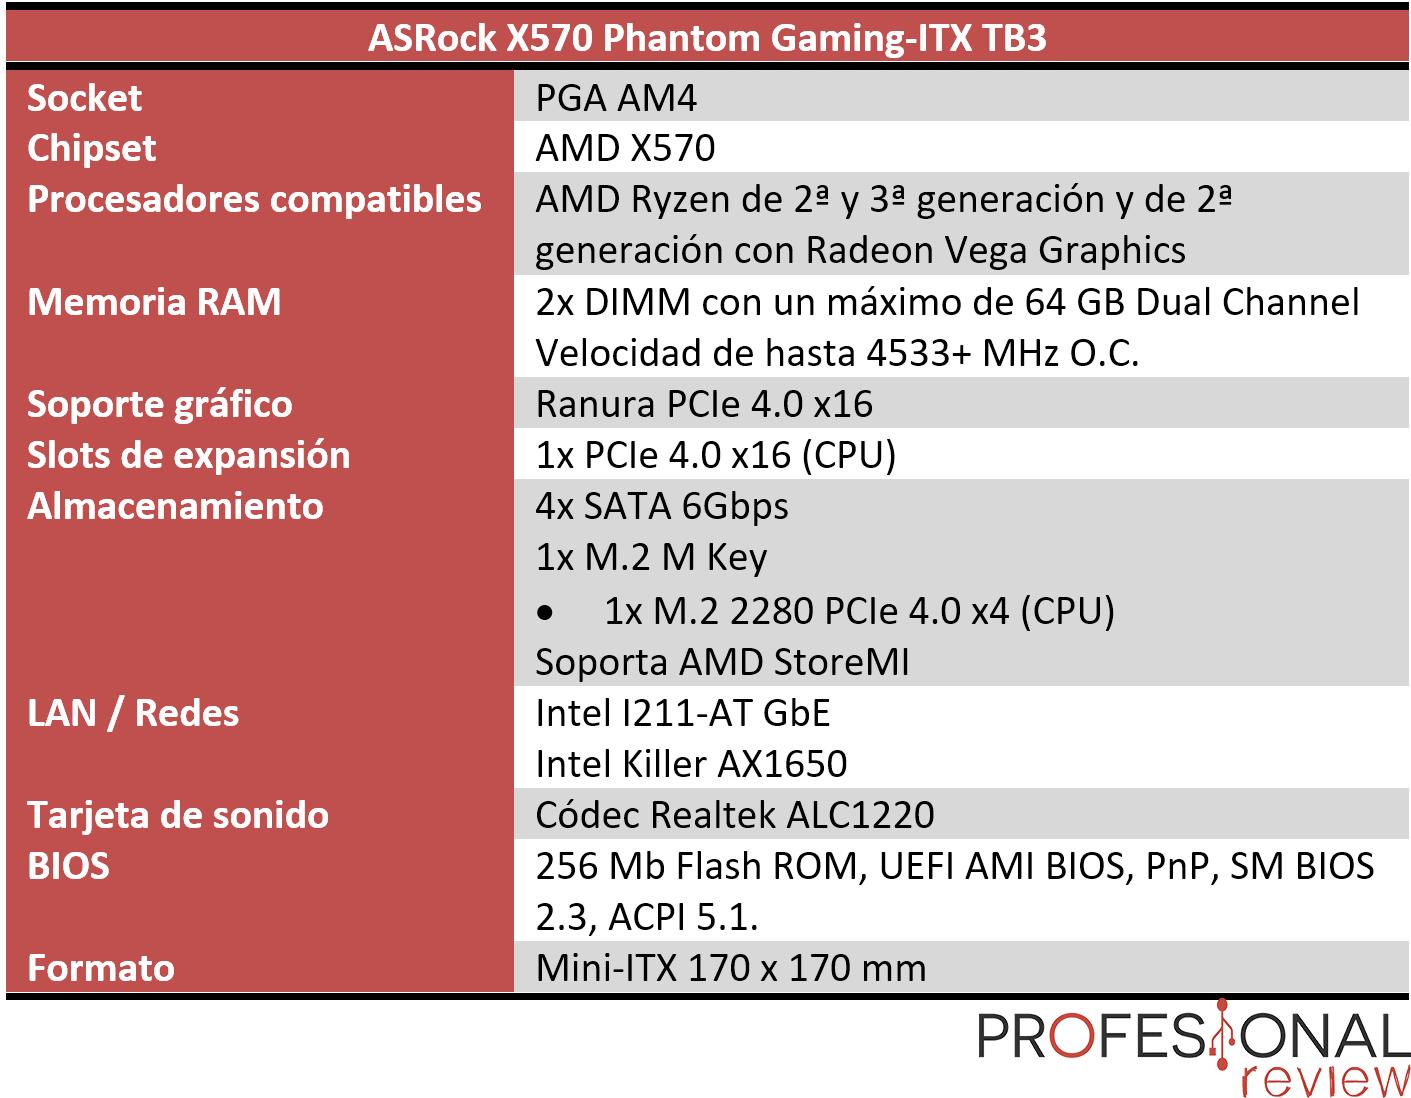 ASRock X570 Phantom Gaming-ITX TB3 características